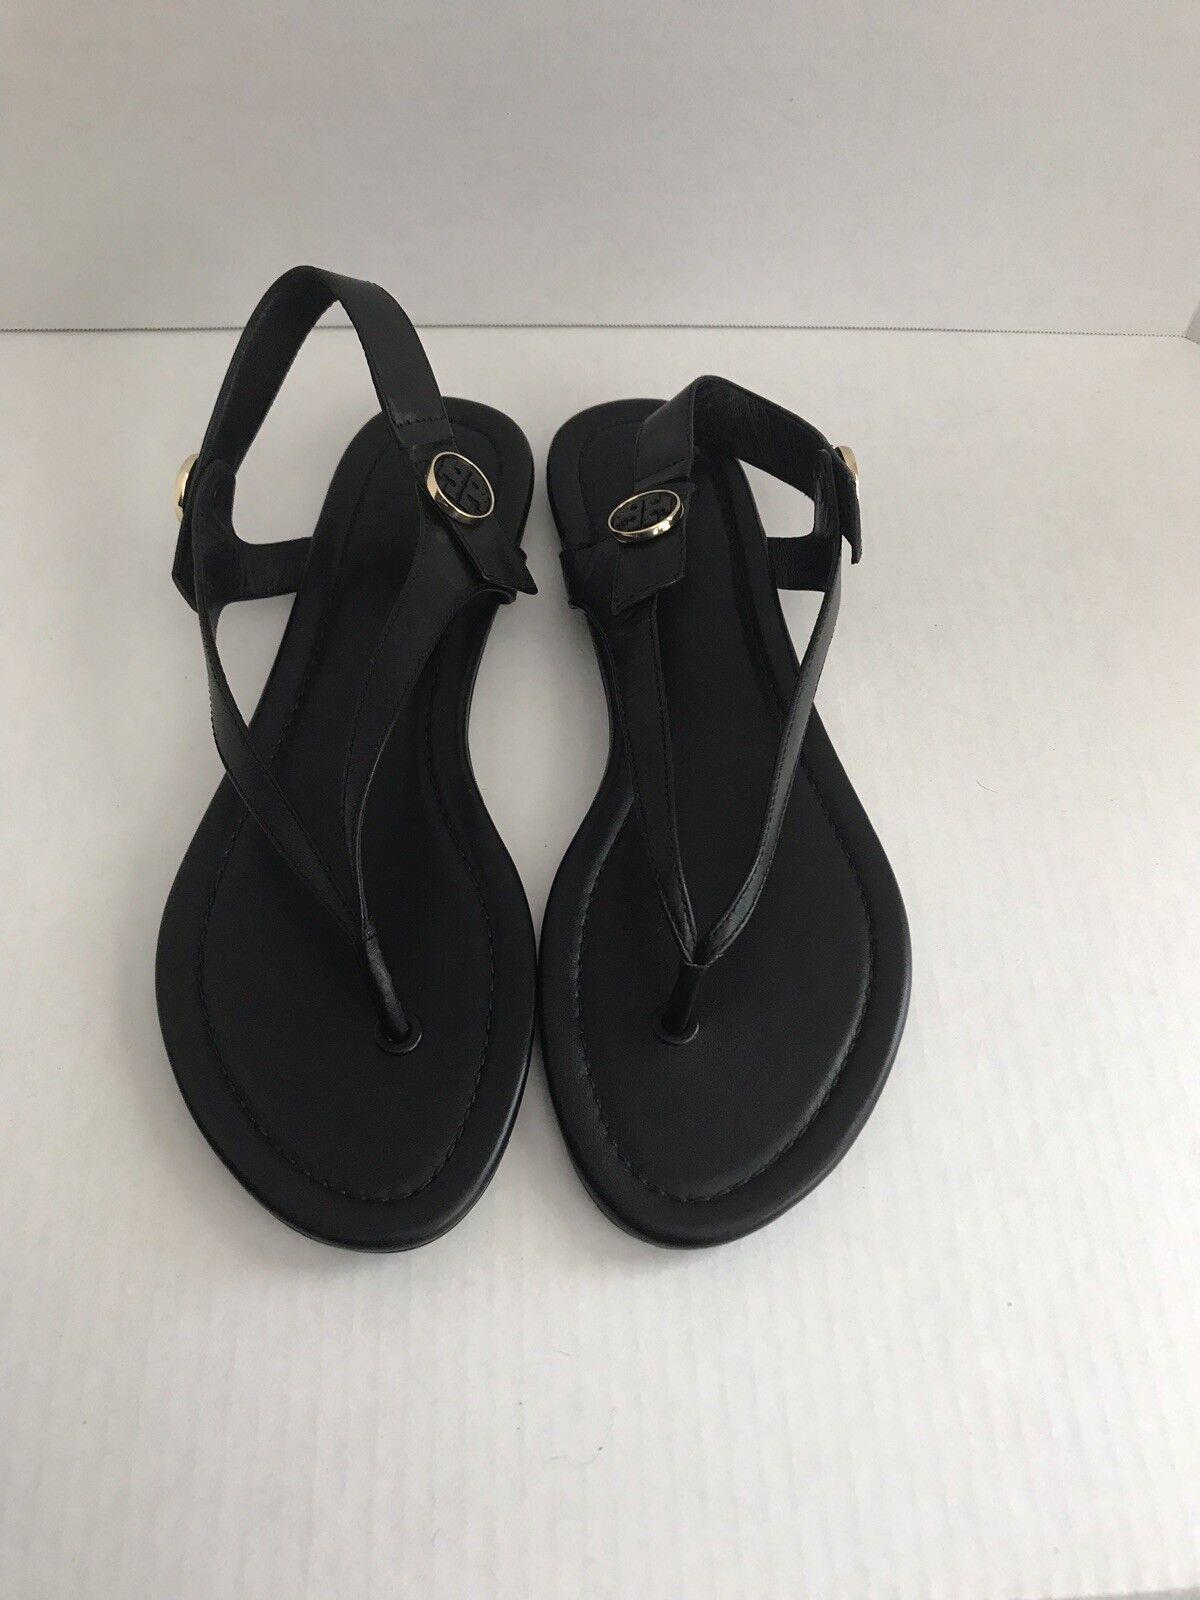 Tory Burch Minnie Leather Flat Travel Sandals Size 9.5 Black